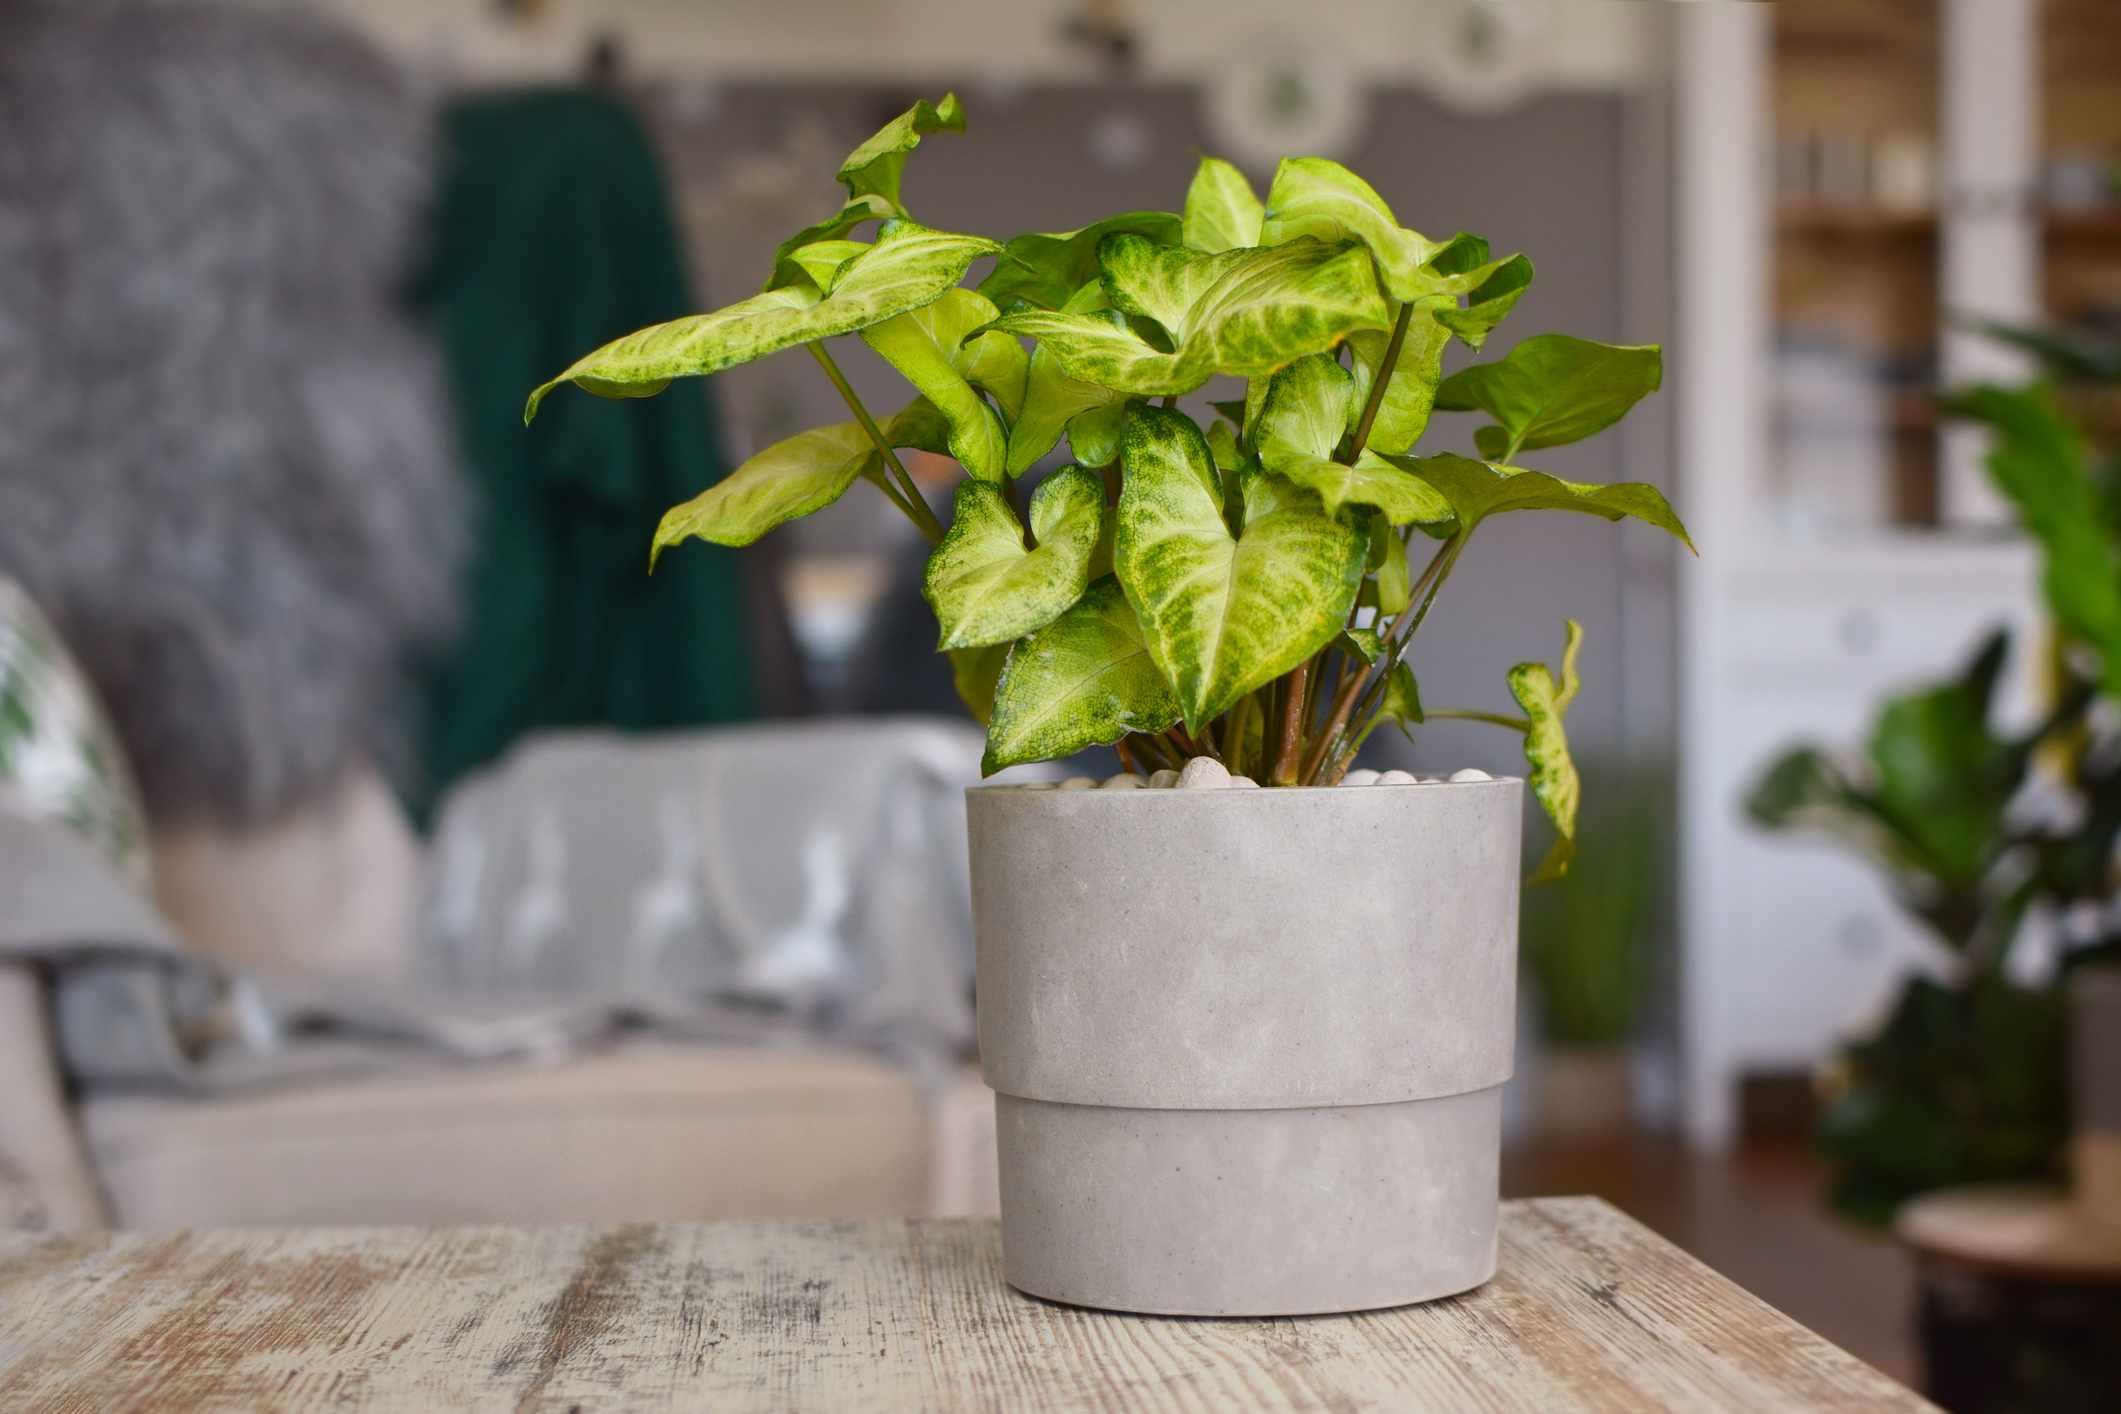 Arrowhead plant (Syngonium podophyllum) in a grey pot.